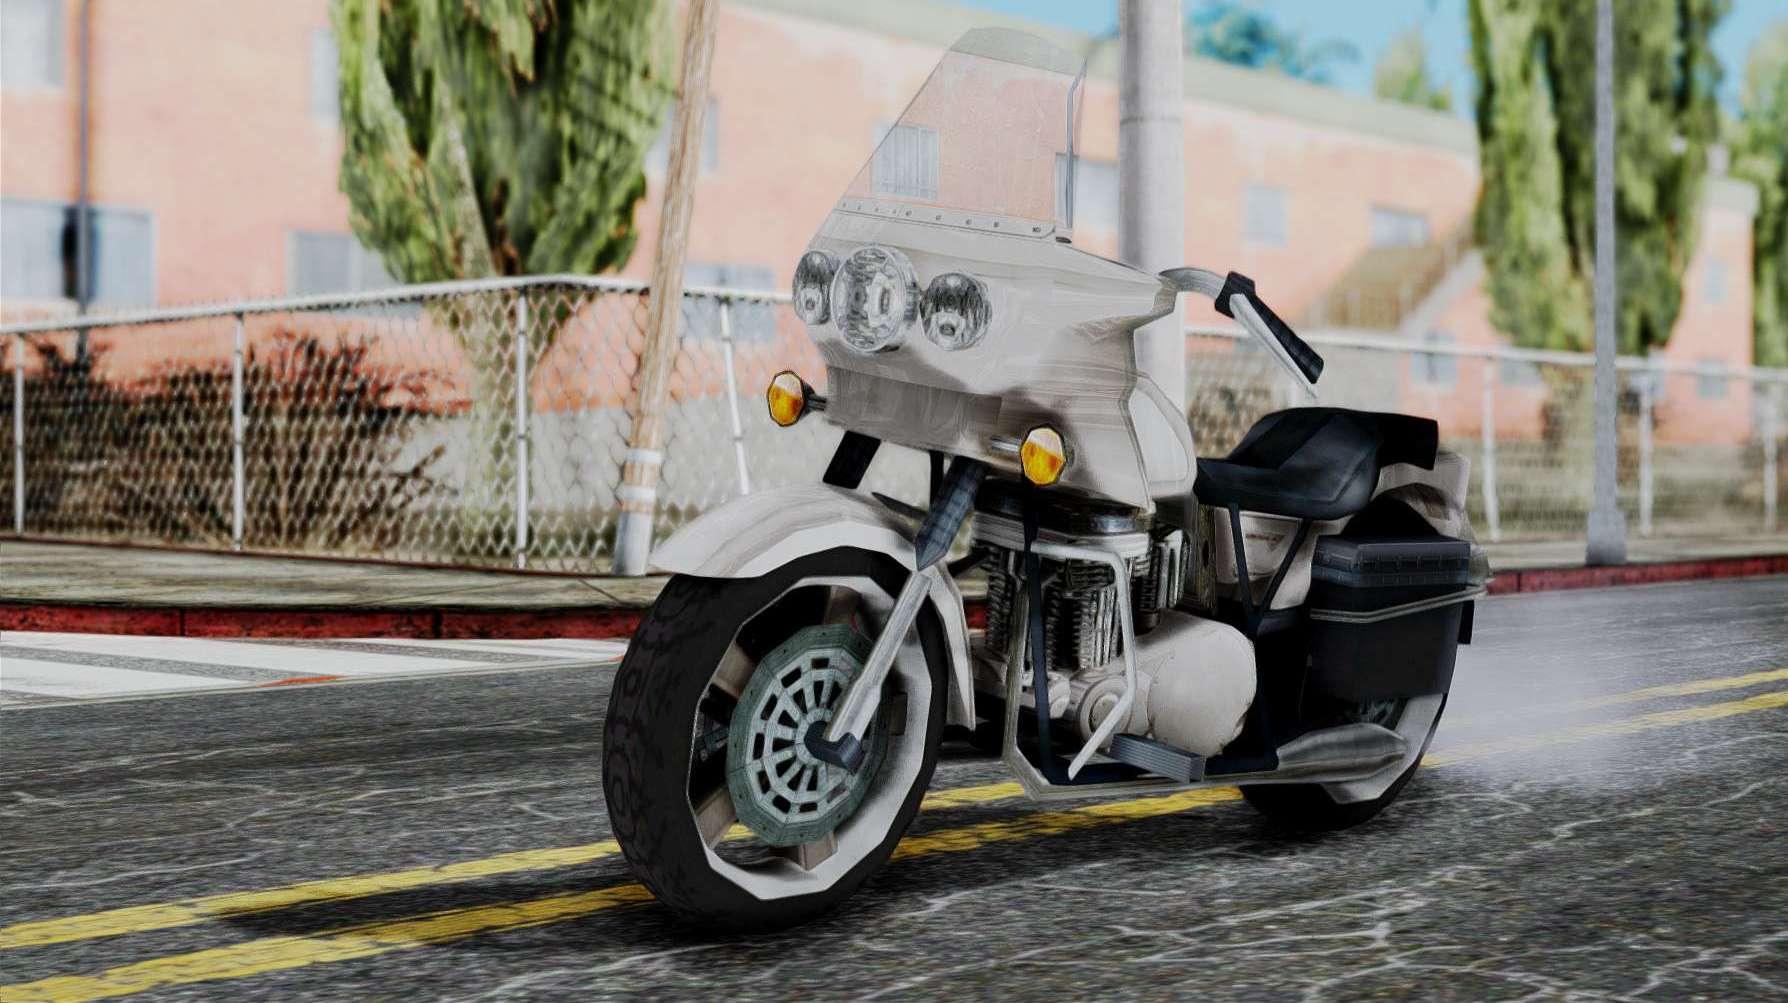 Гифка дня: не самая удобная езда на мотоцикле в GTA: San Andreas | Канобу